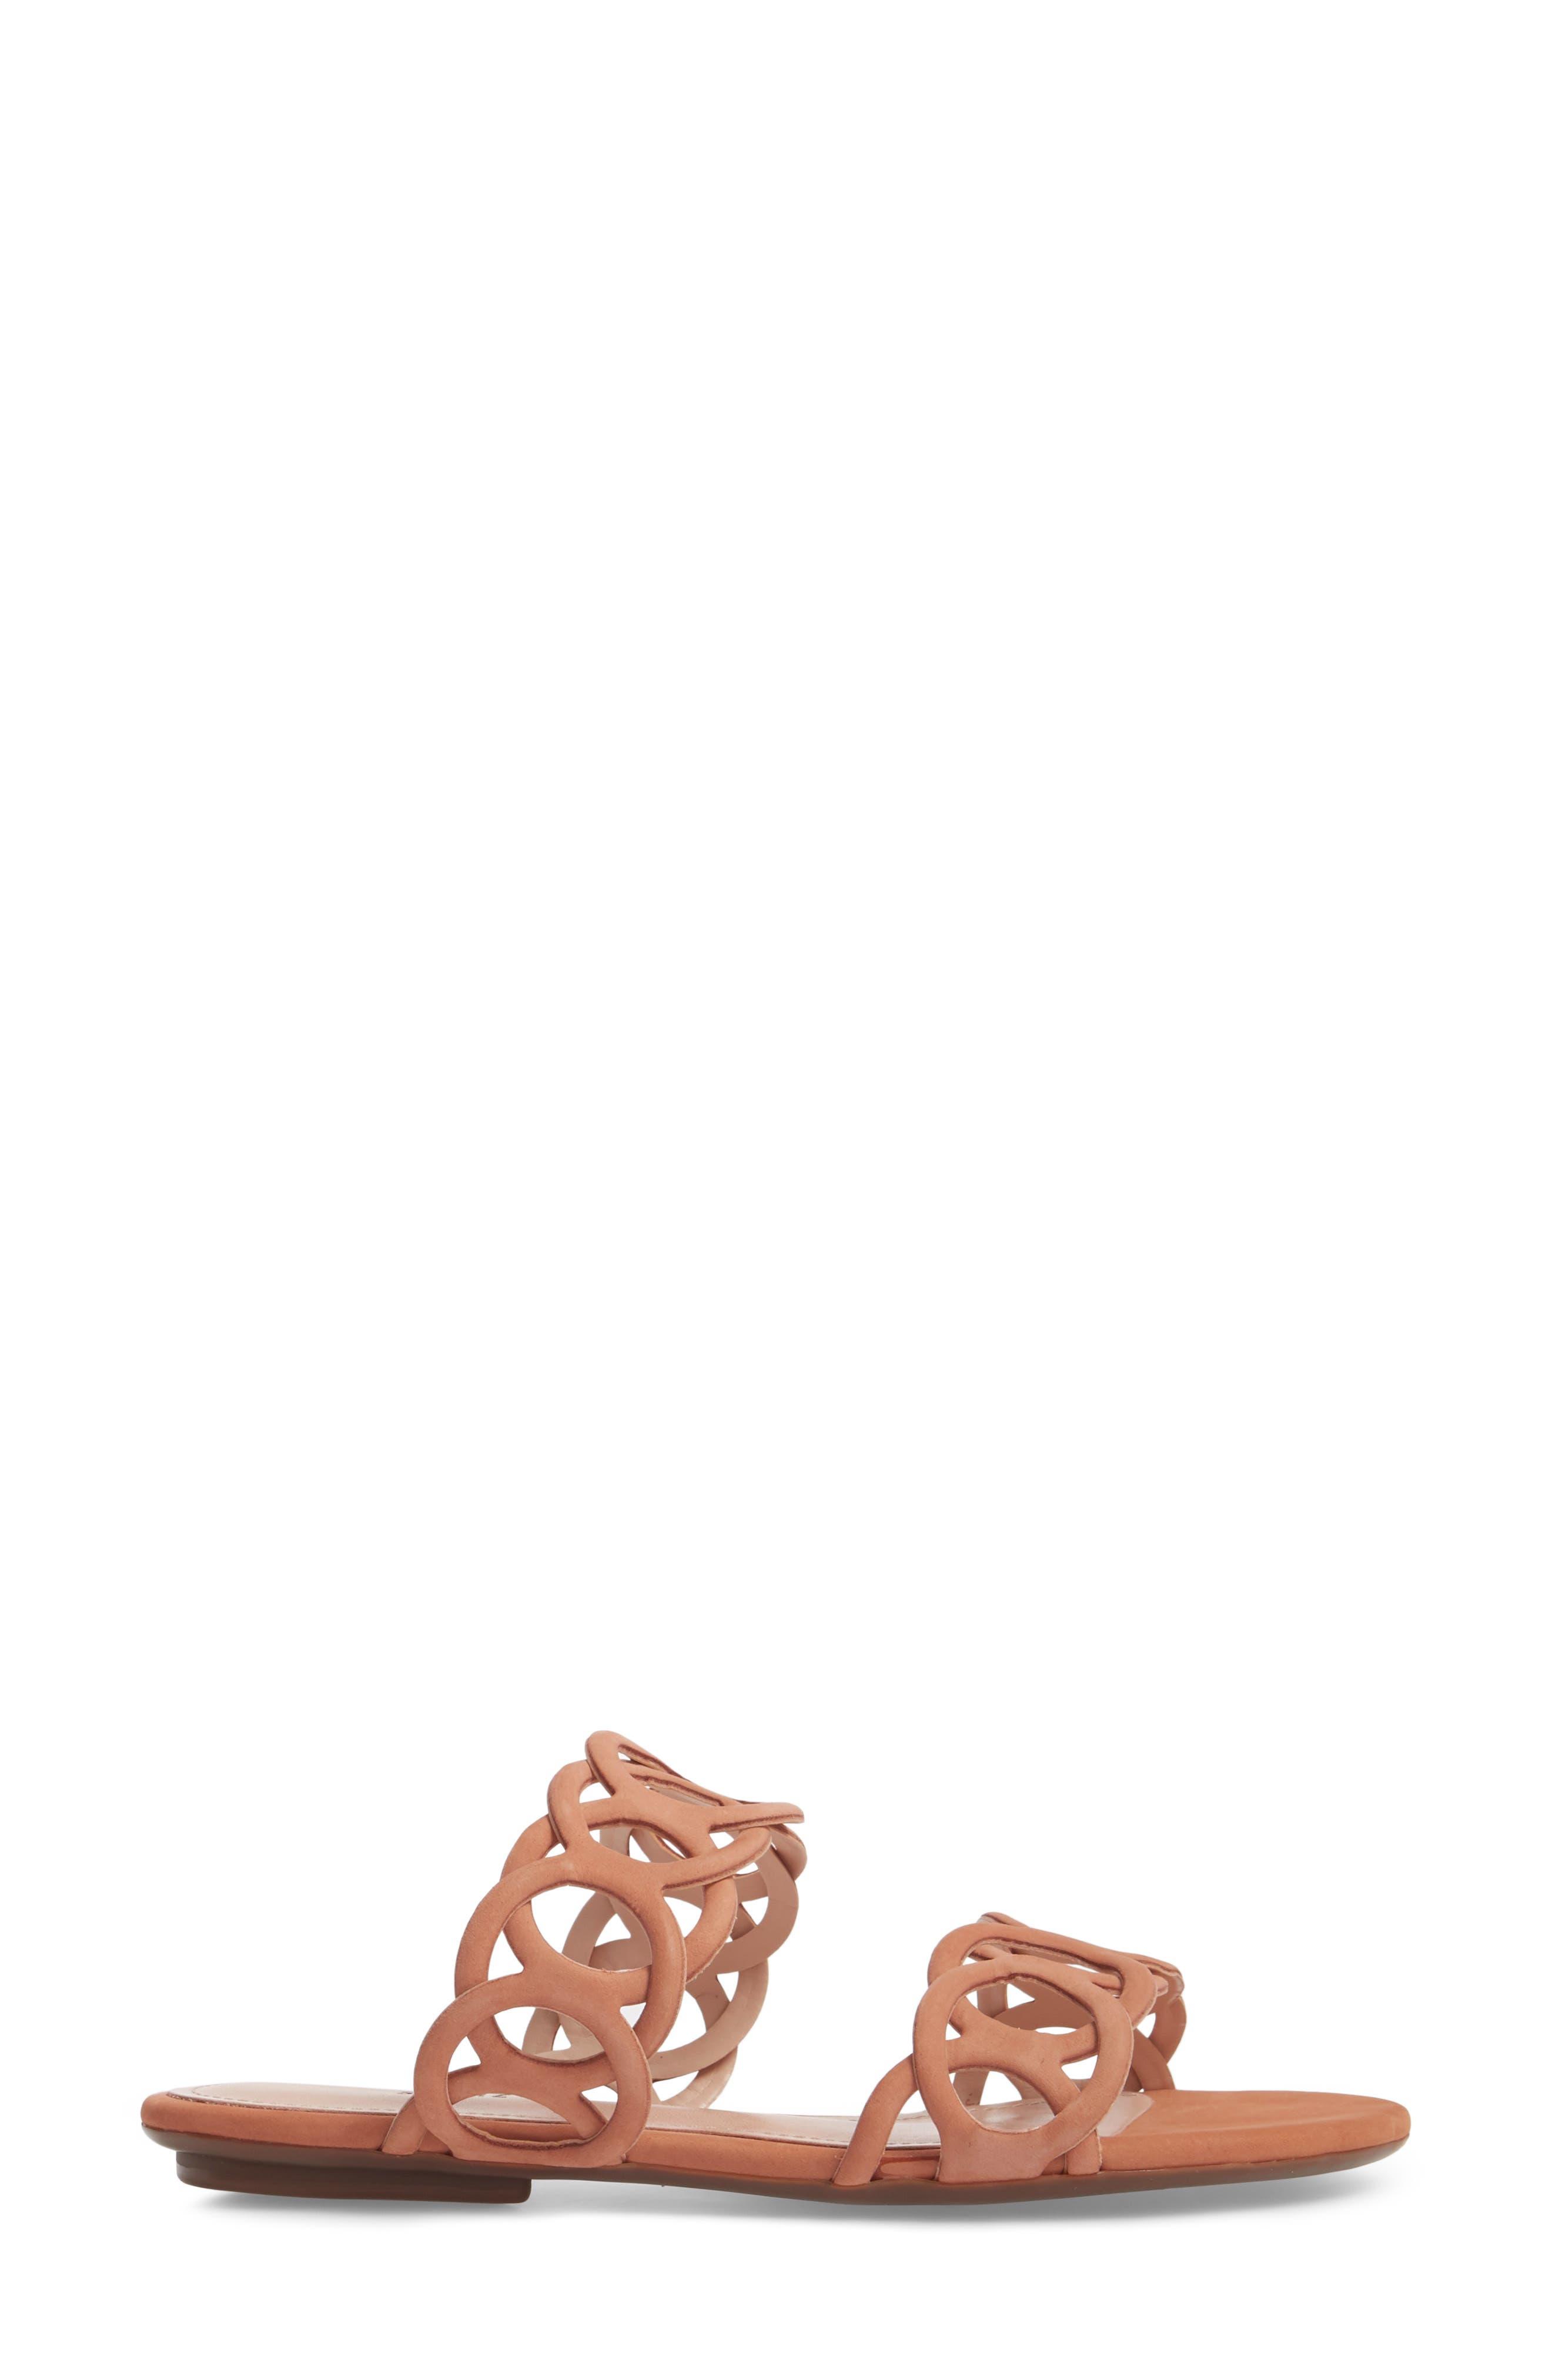 Yaslin Slide Sandal,                             Alternate thumbnail 3, color,                             Toasted Nut Leather